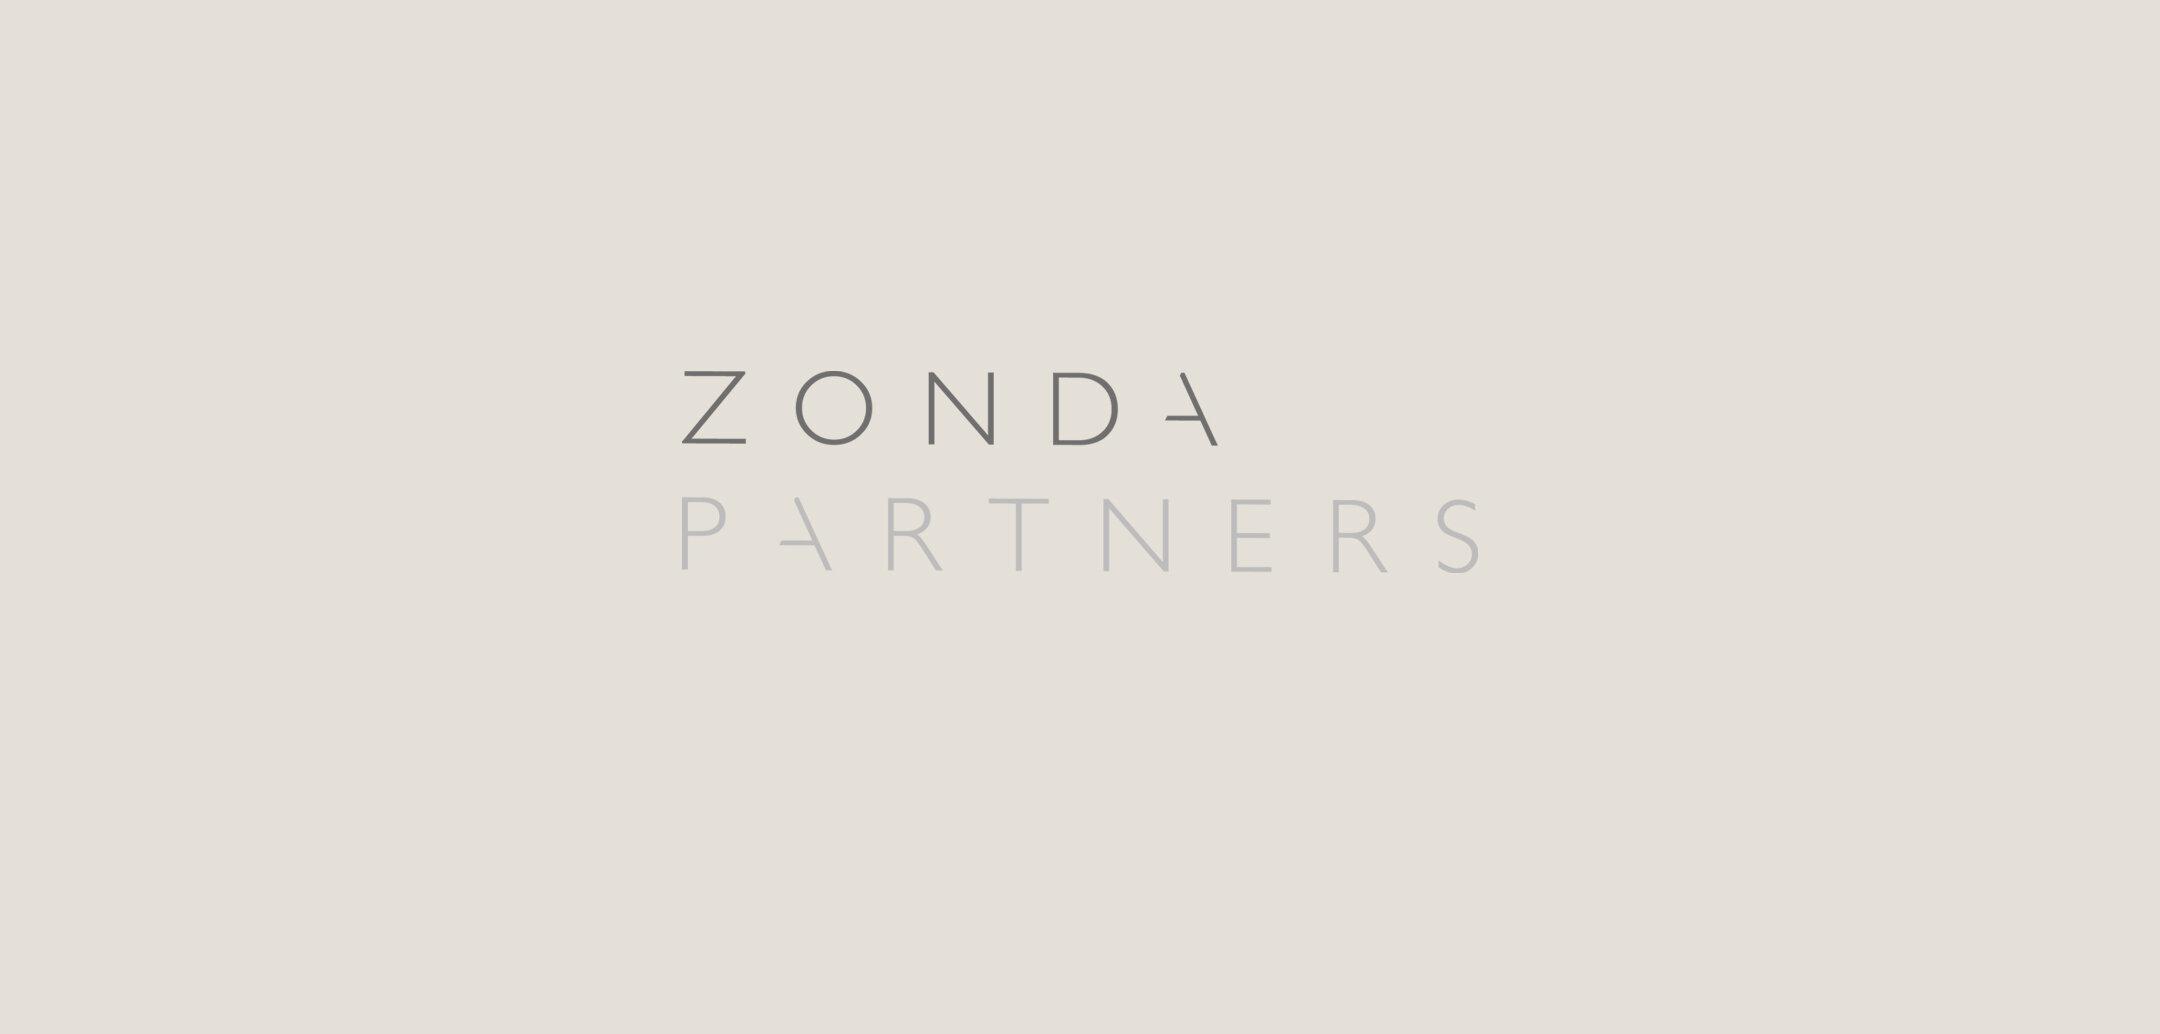 Banner_Logos_Zonda.jpg